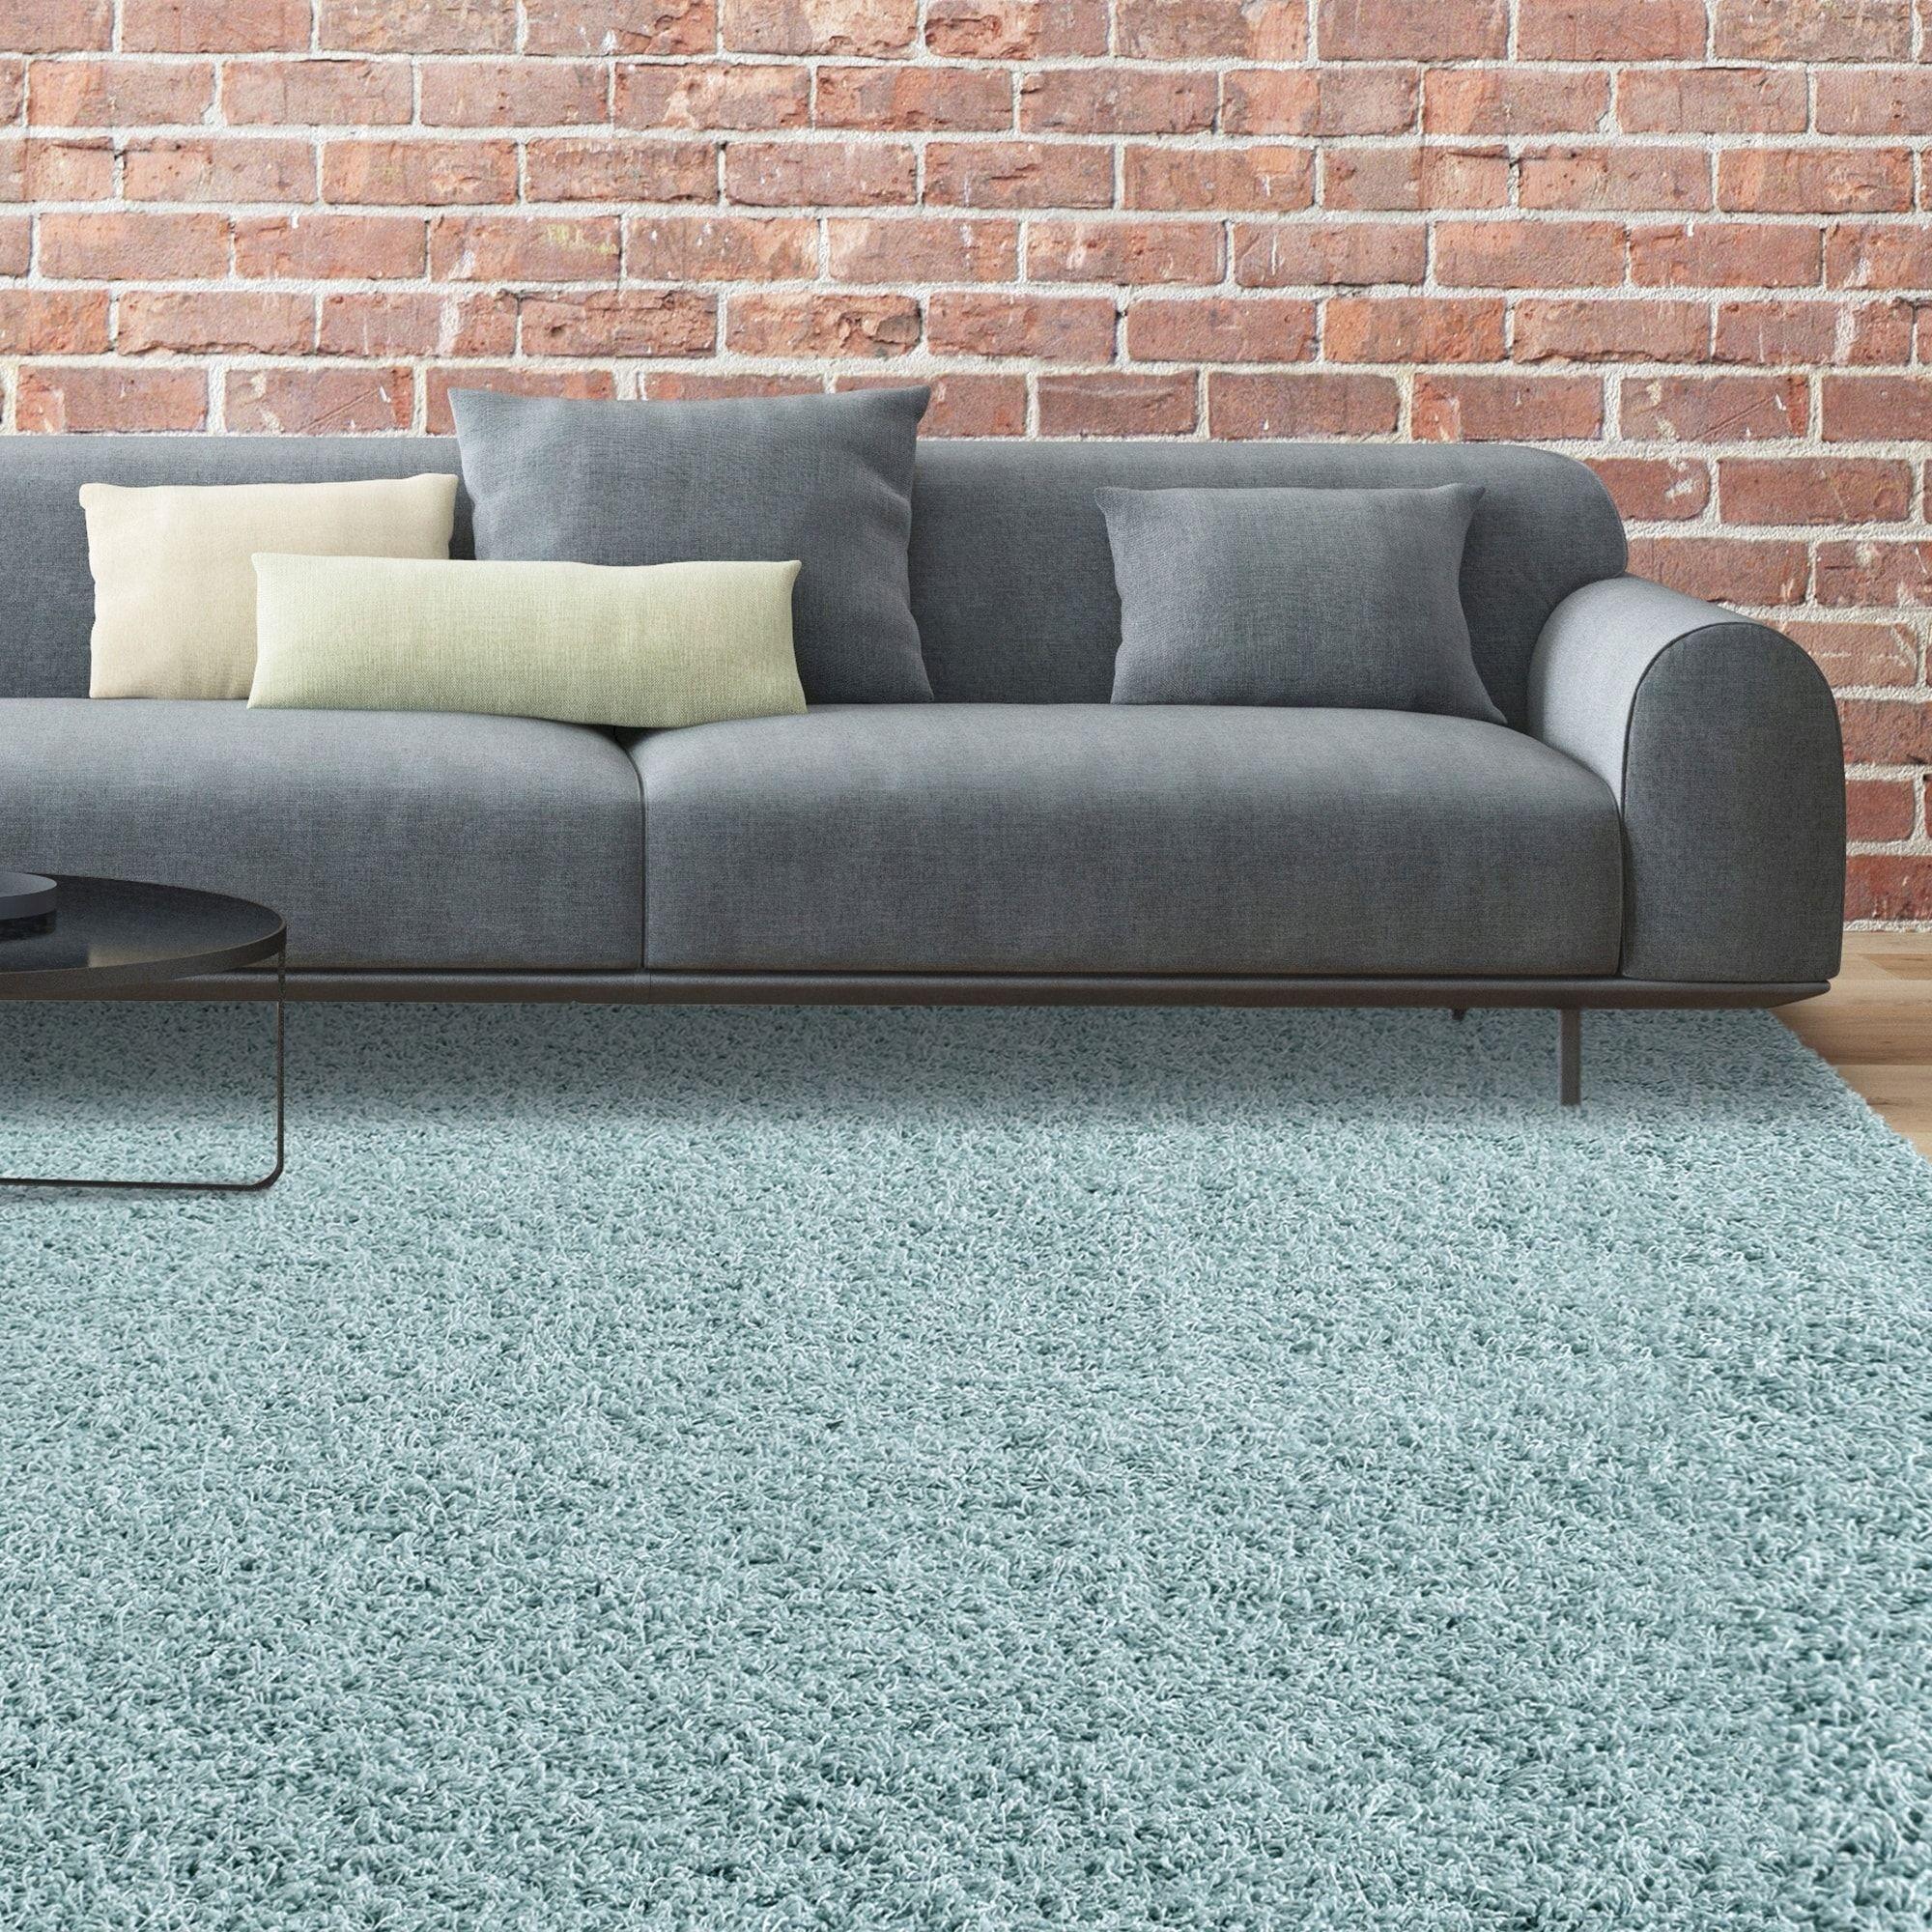 Icustomrug bella shag rug luxurious and thick in light blue u x